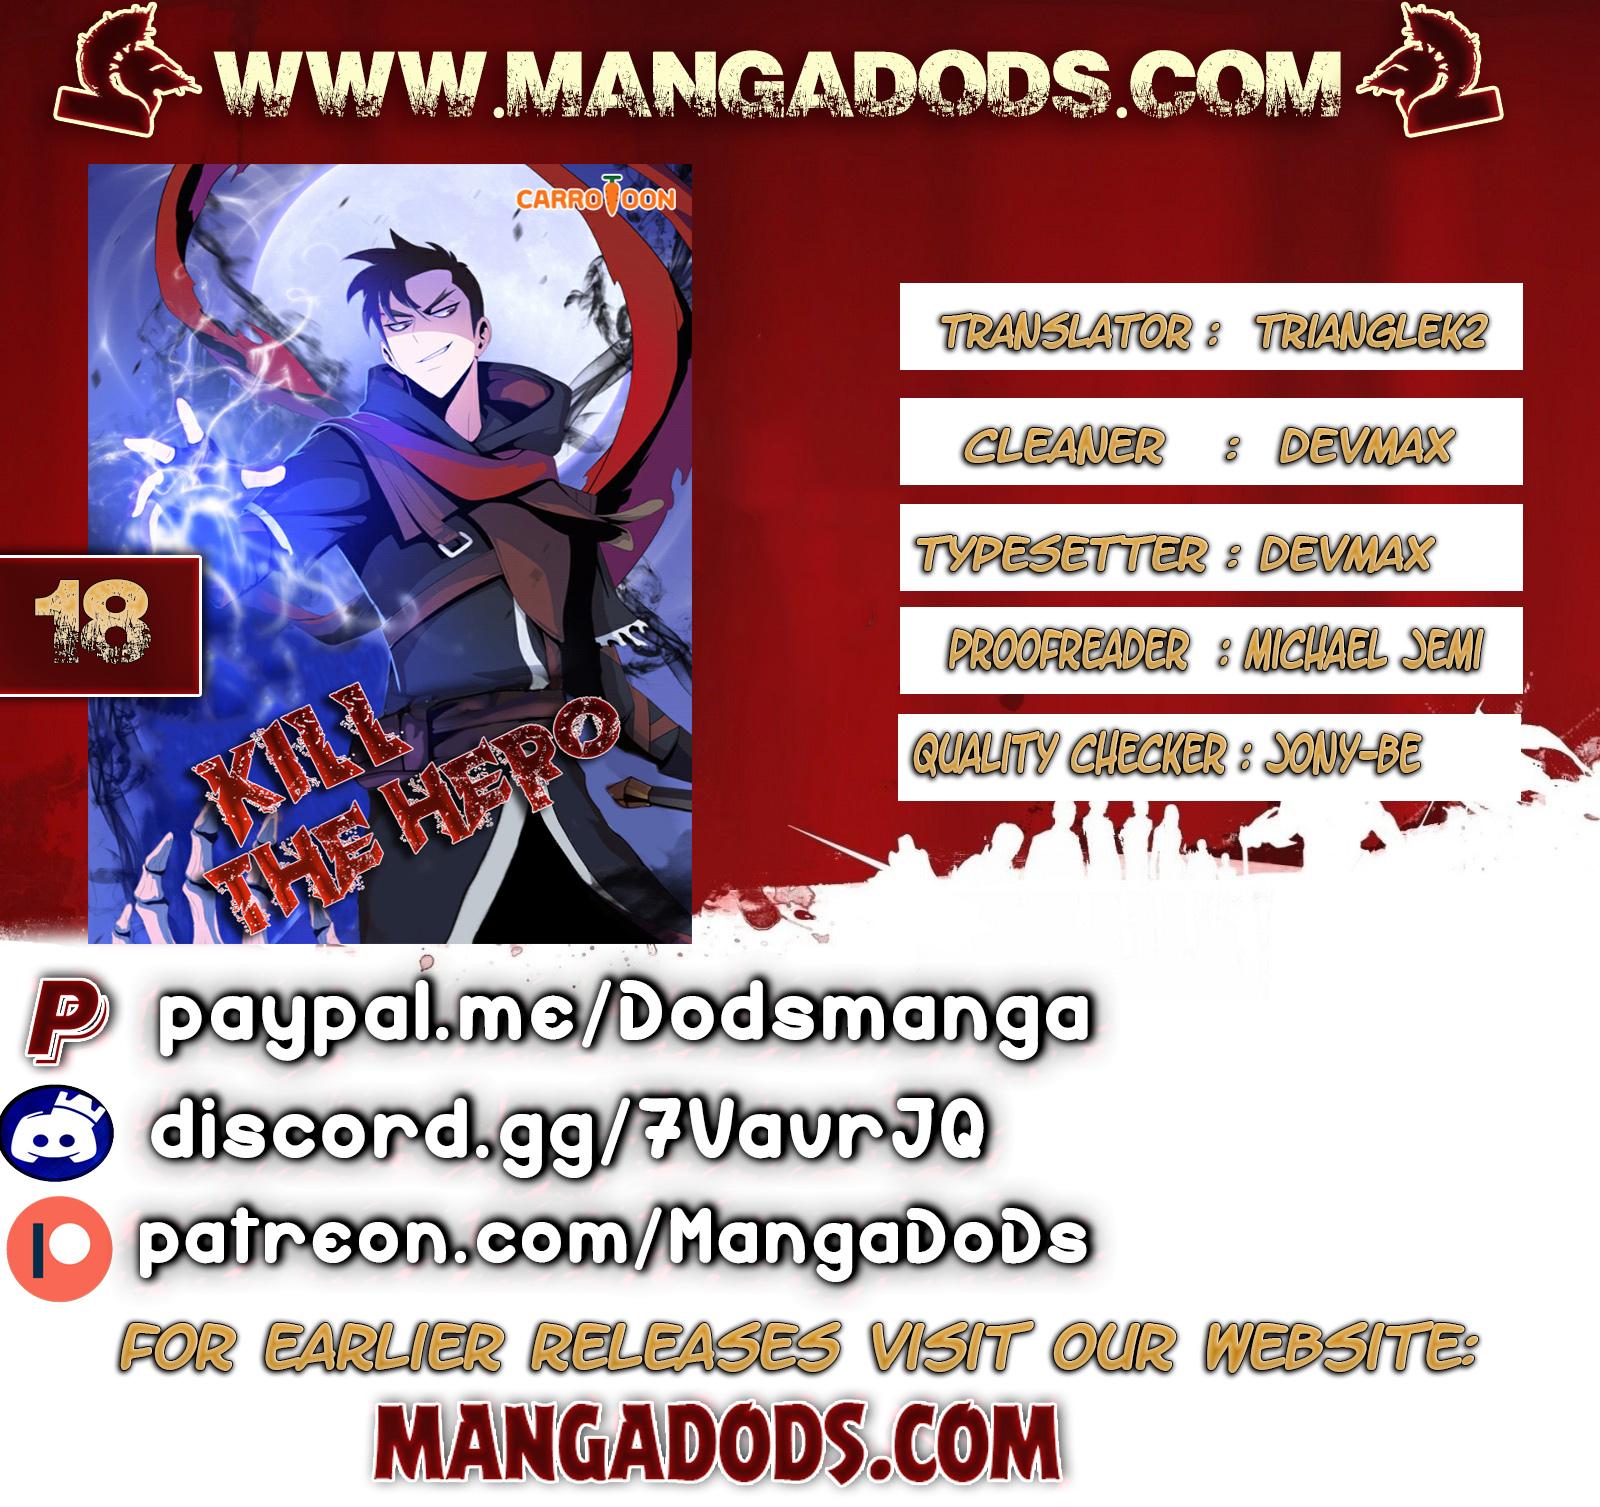 https://img2.nineanime.com/comics/pic3/36/36196/1491981/ff2b205b94763692ae03846c493a5ce7.jpg Page 1